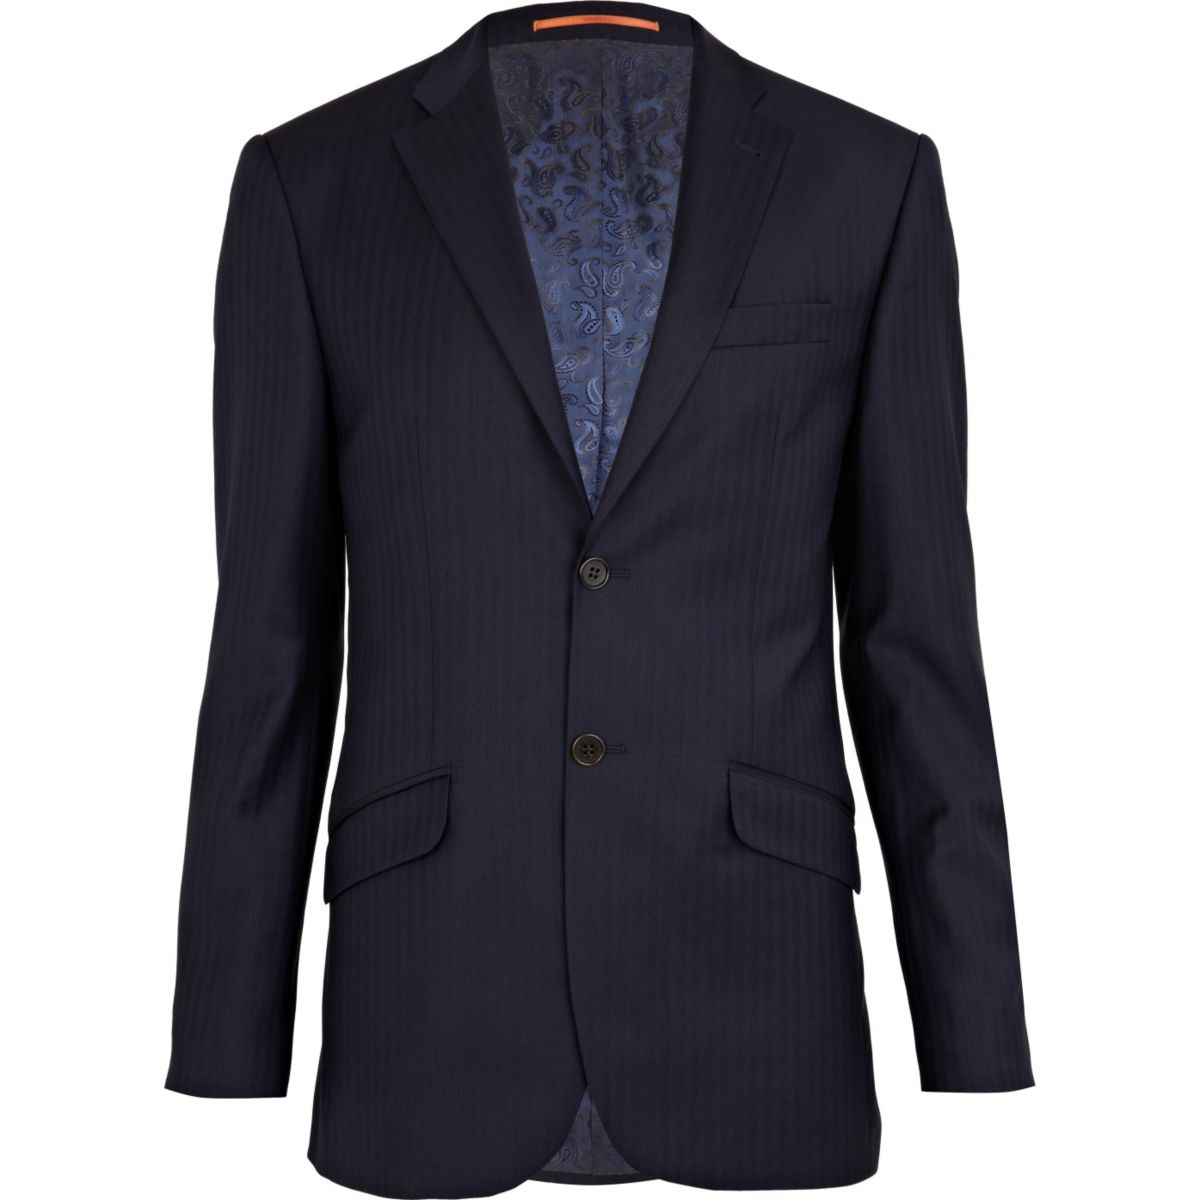 Navy herringbone Life Of Tailor suit jacket